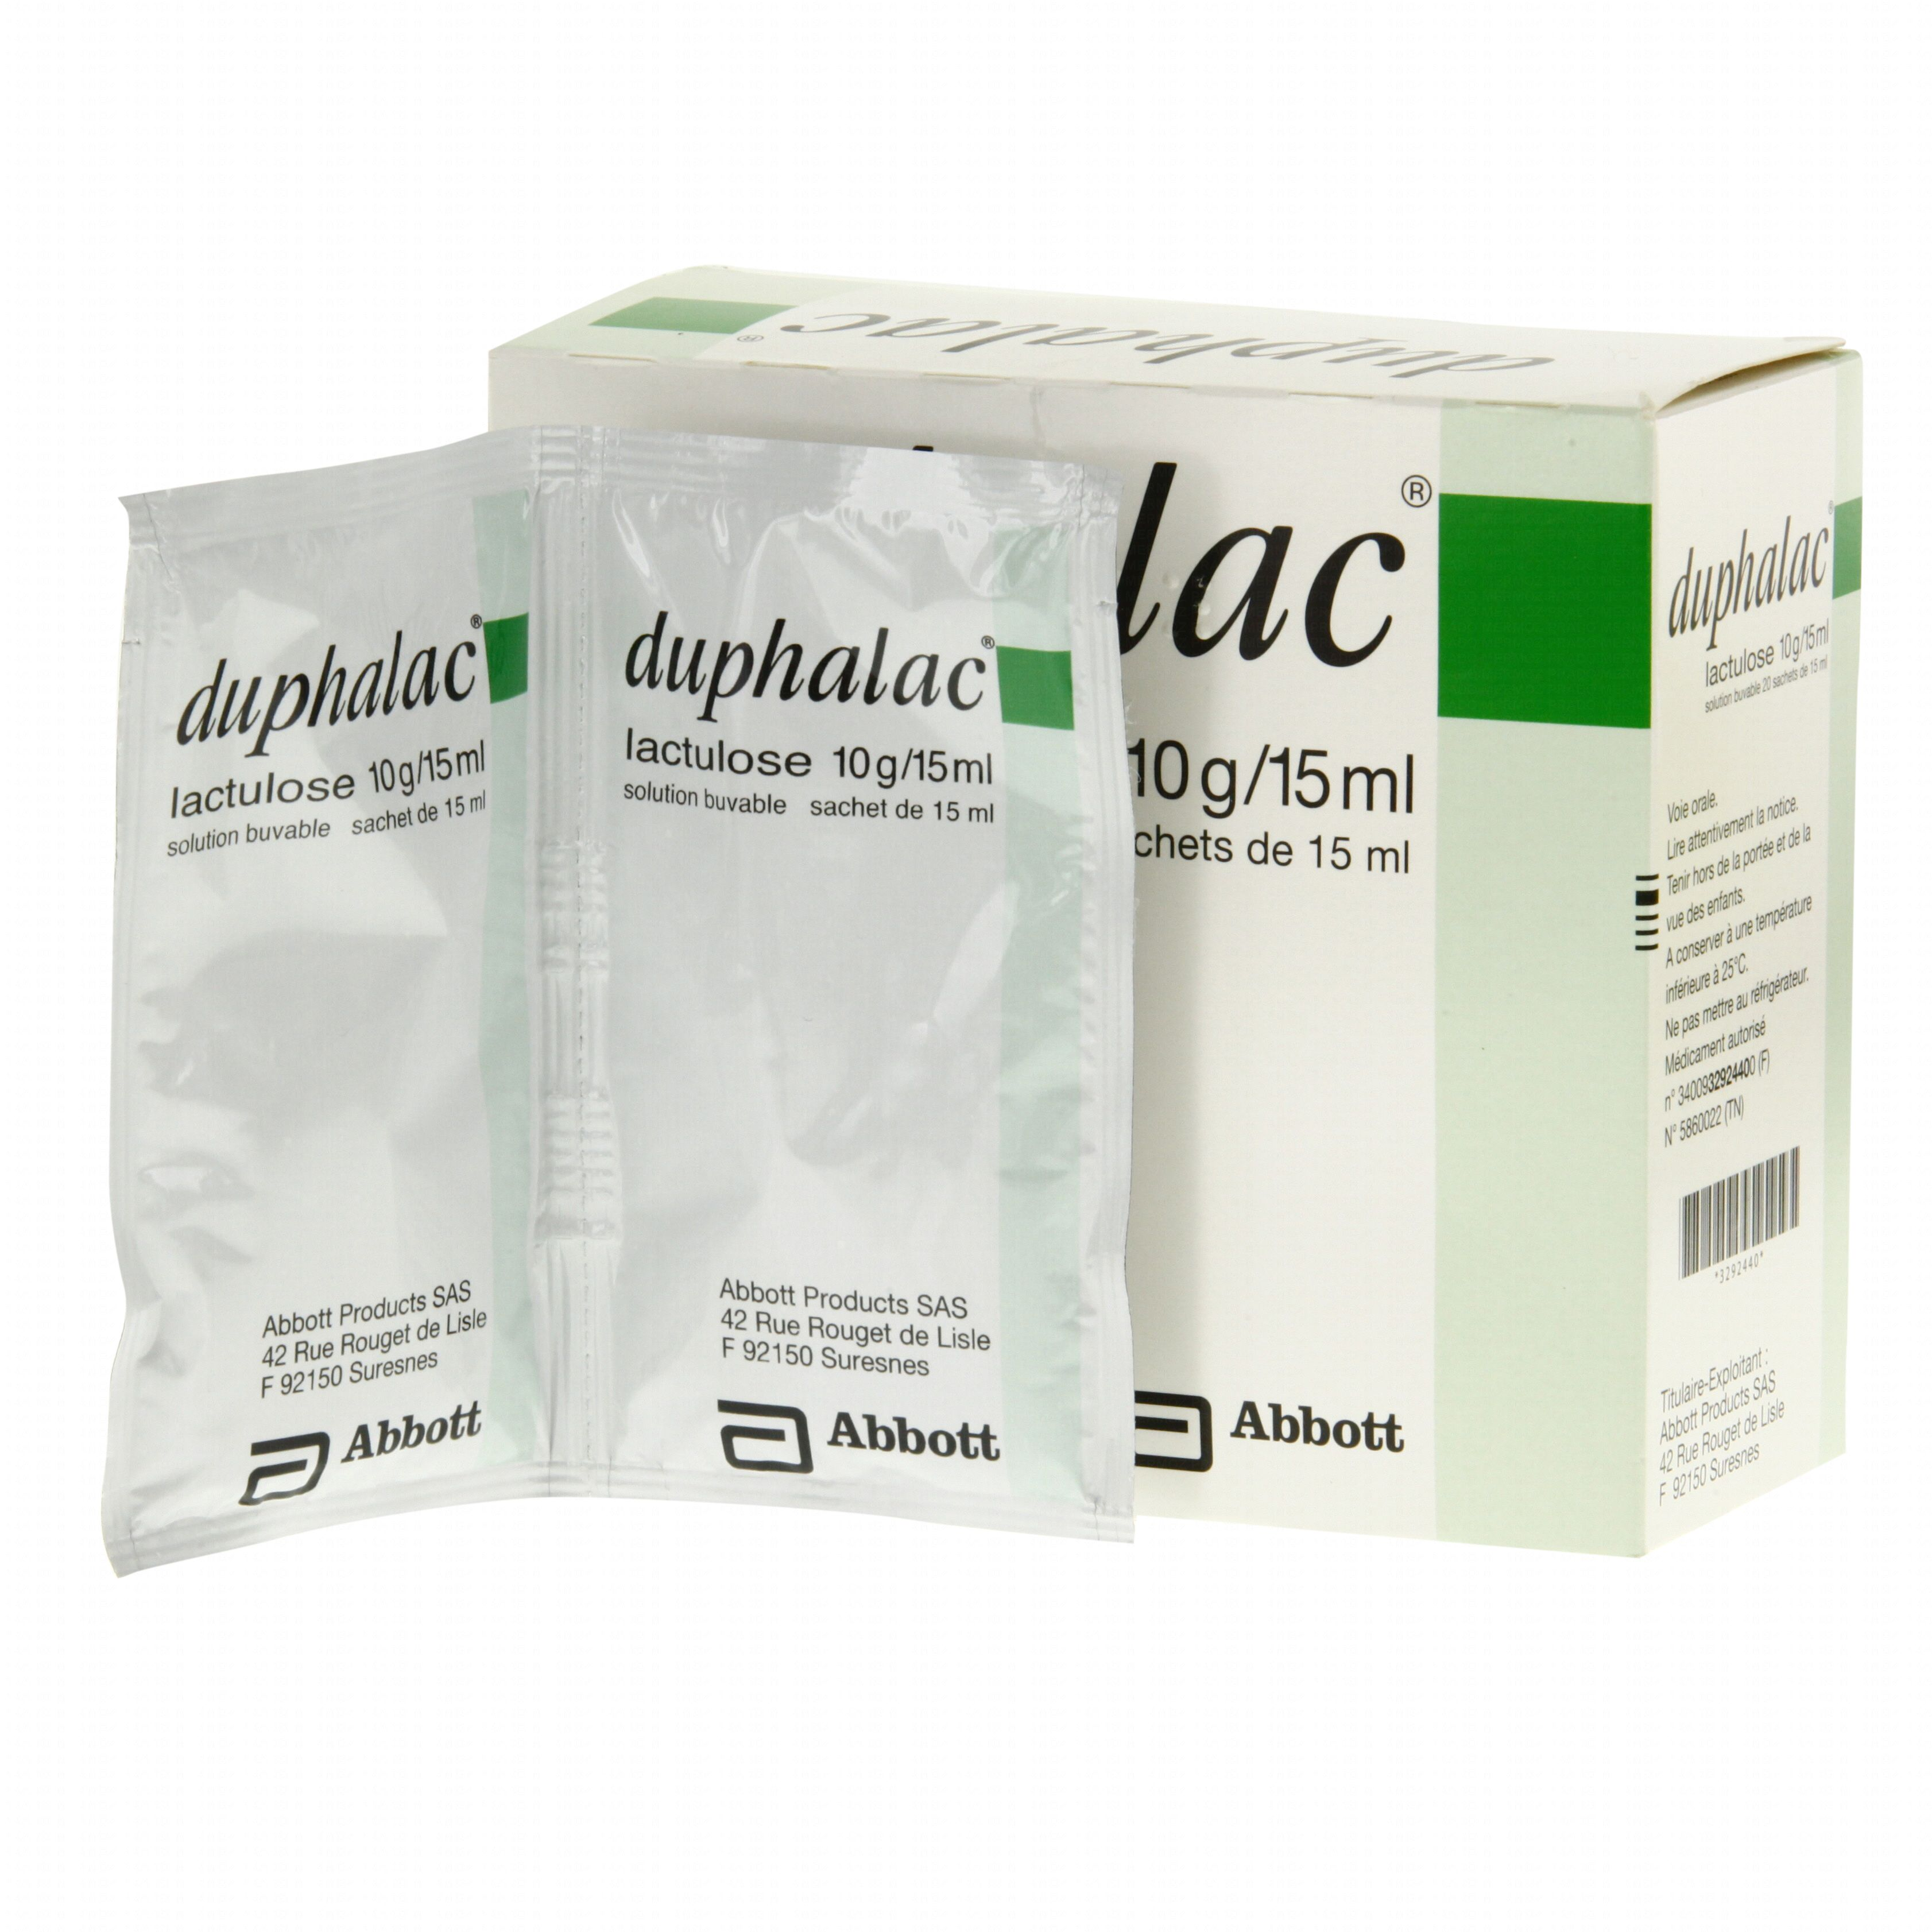 Duphalac 10 g/15 ml boîte de 20 sachets-doses Abbott